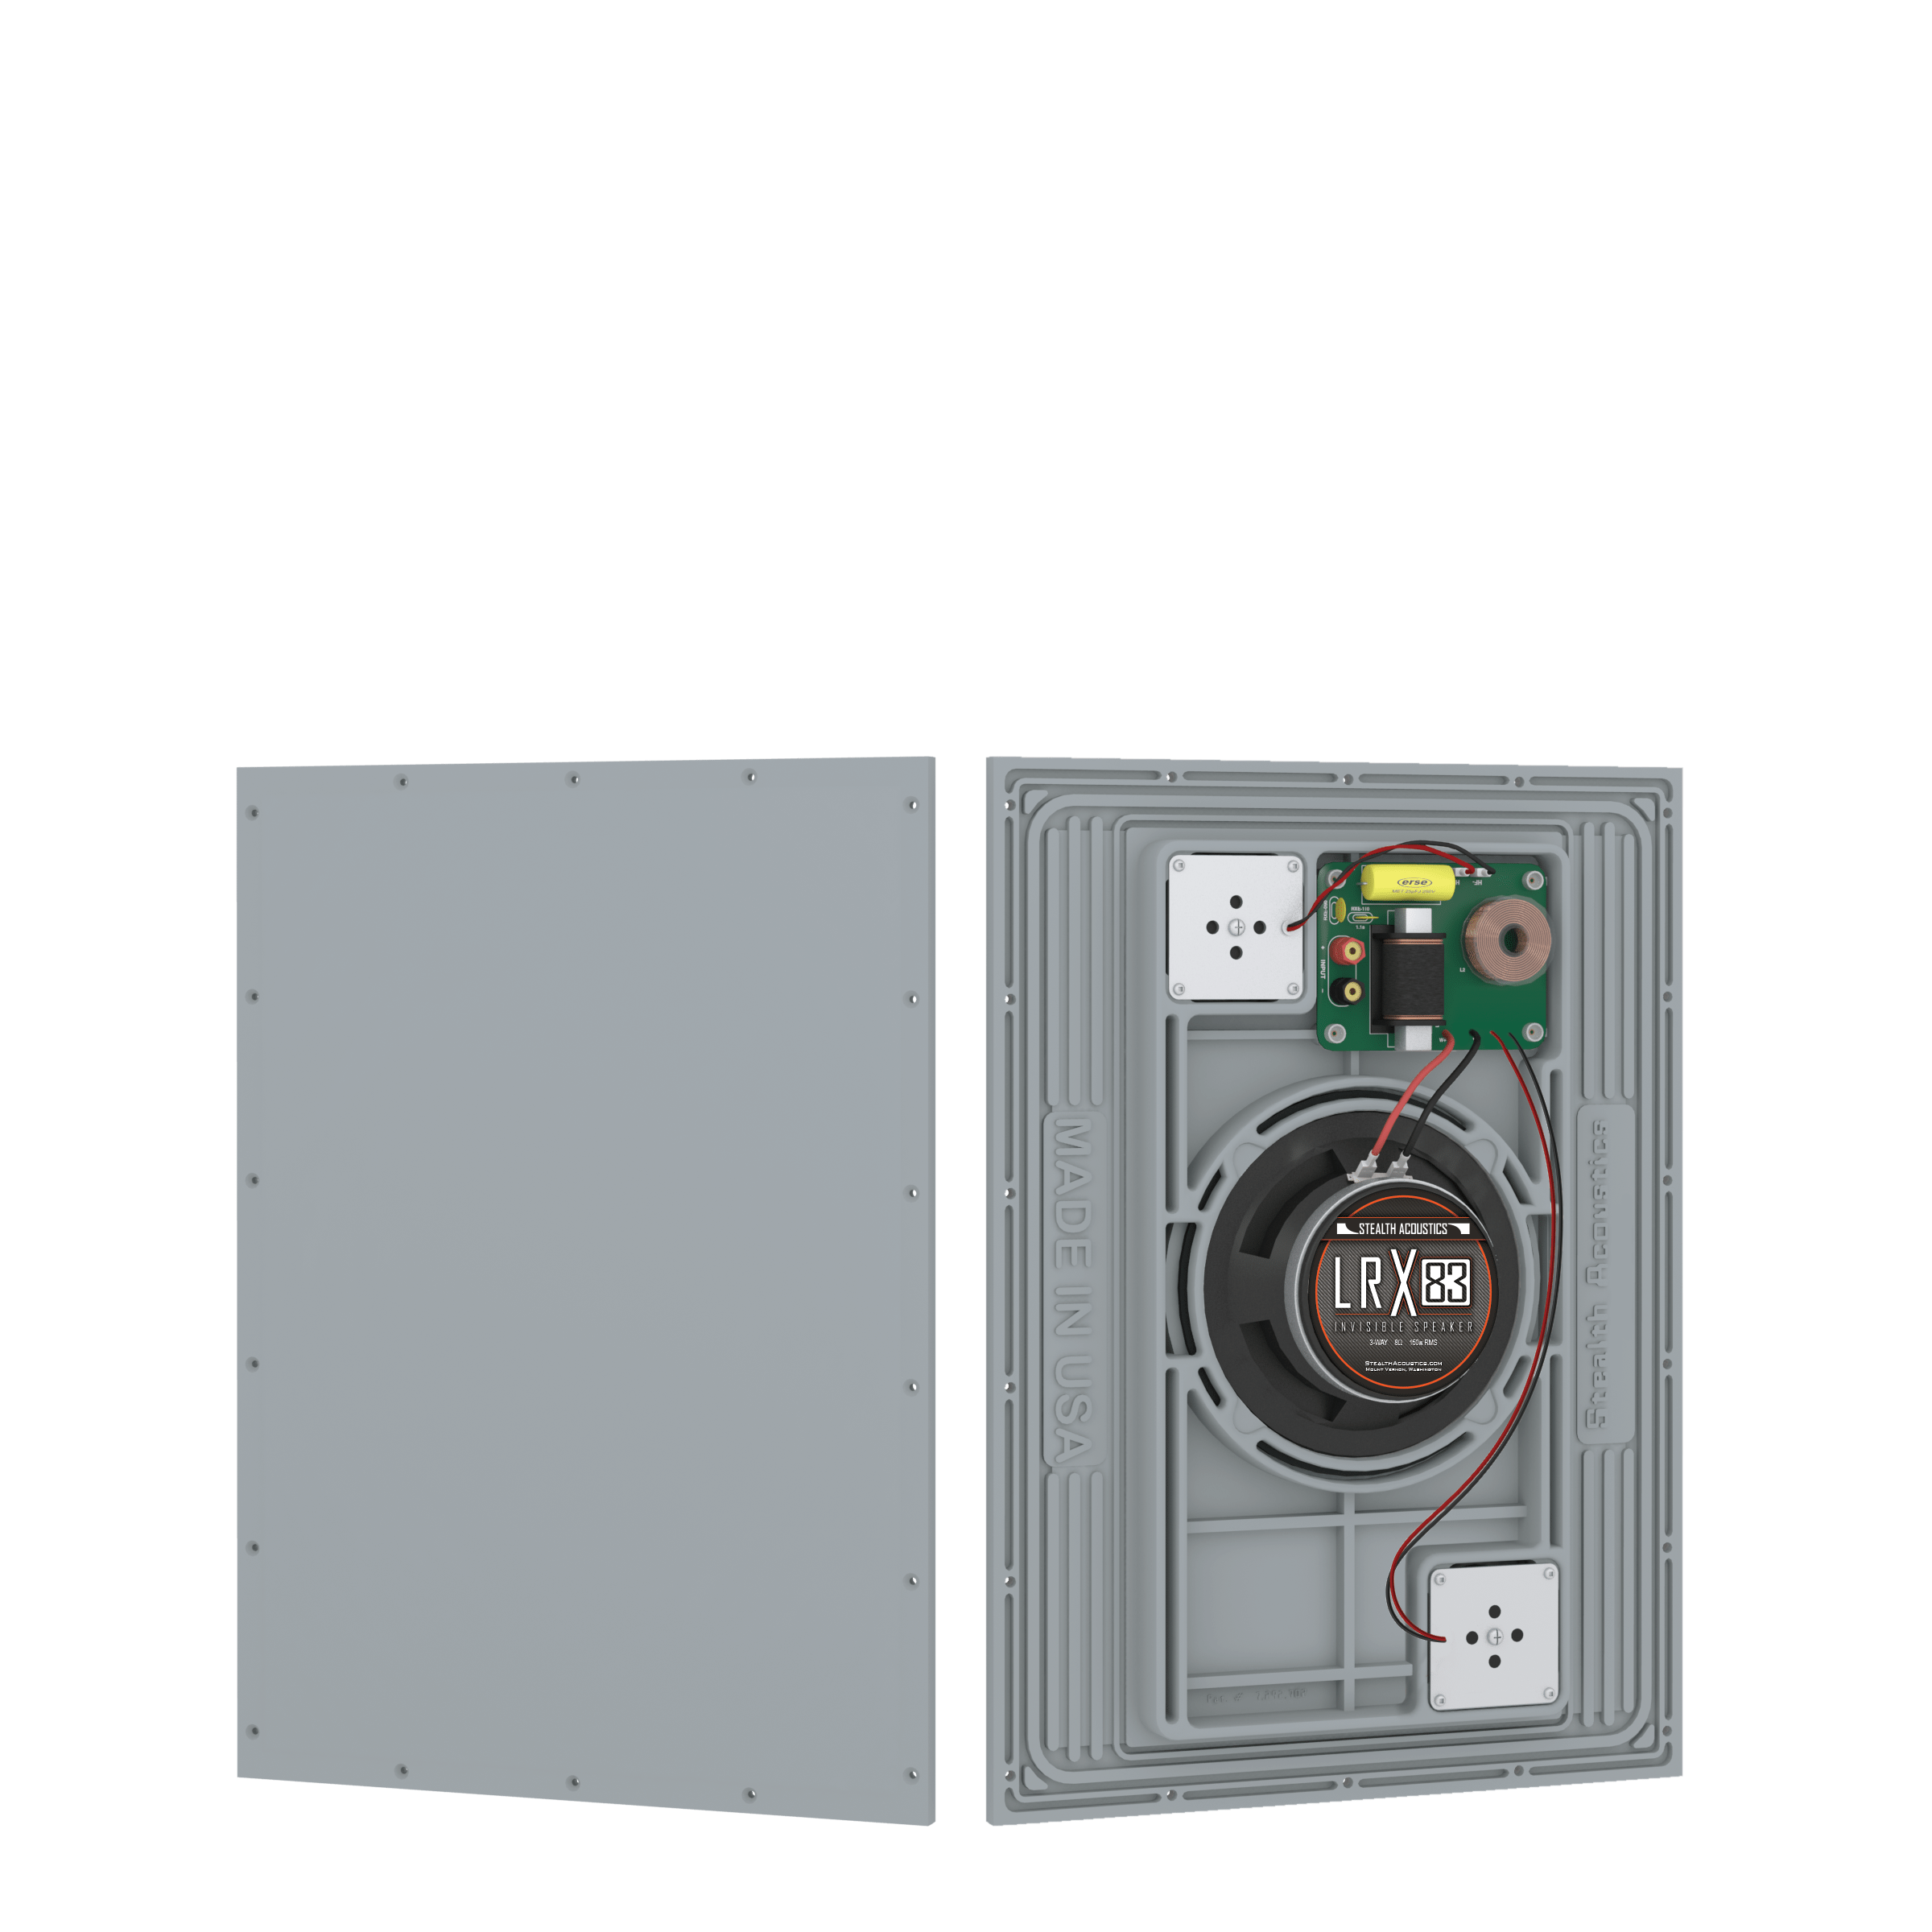 Stealth LRX-83 speakers